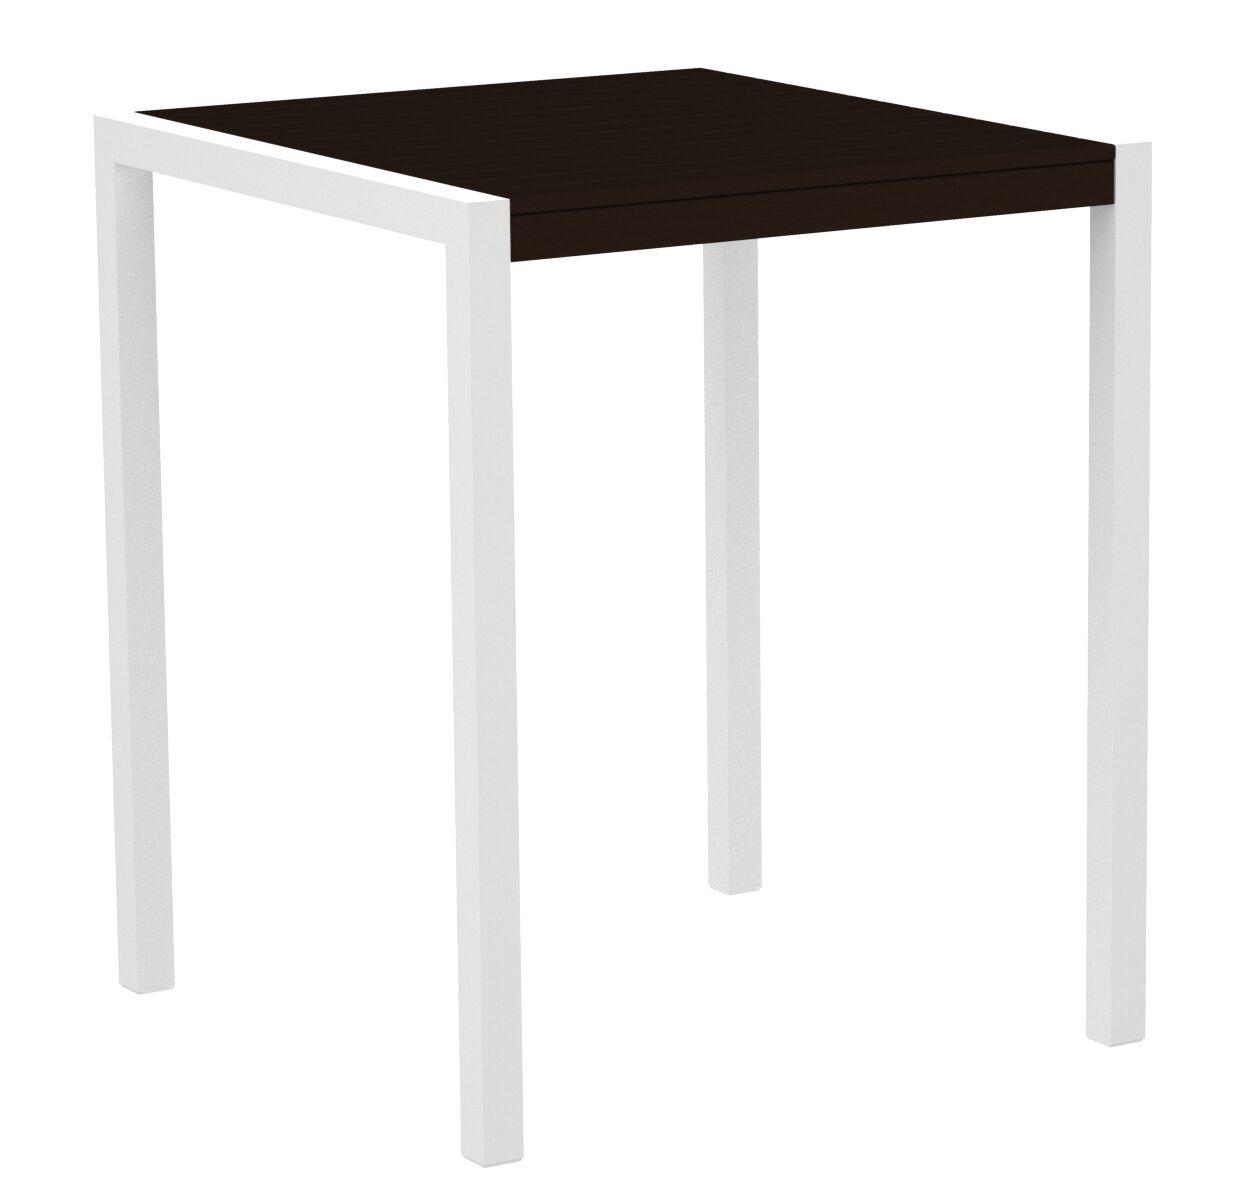 Mod Bar Table Base Finish: Textured White, Top Finish: Mahogany